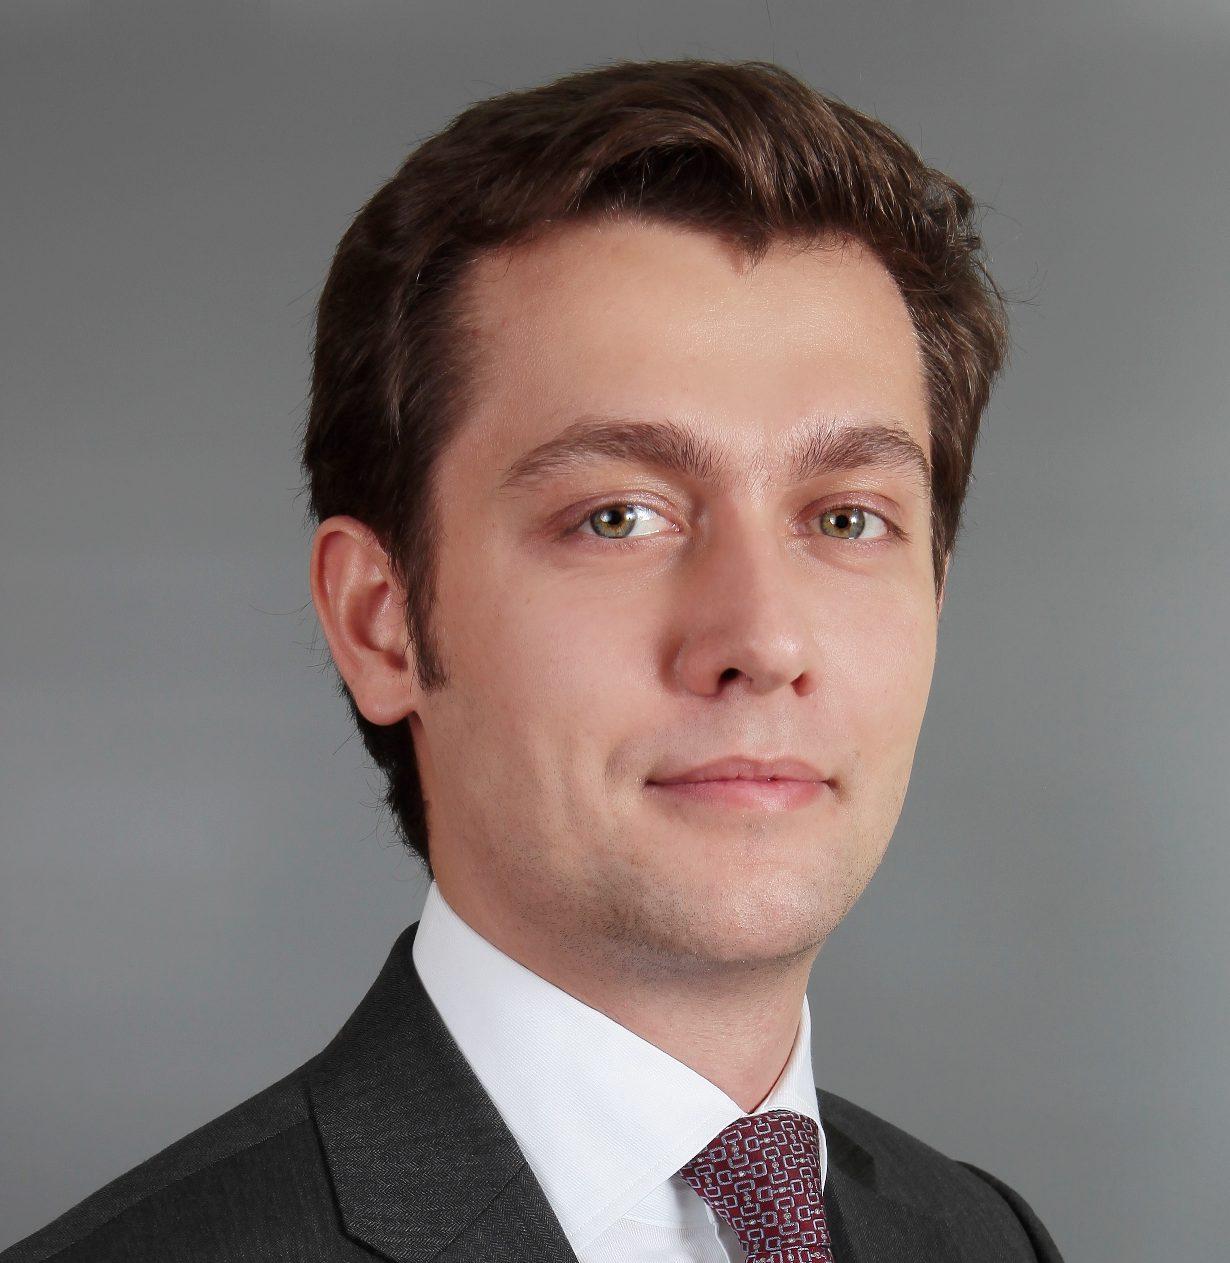 Кирилл Игнахин